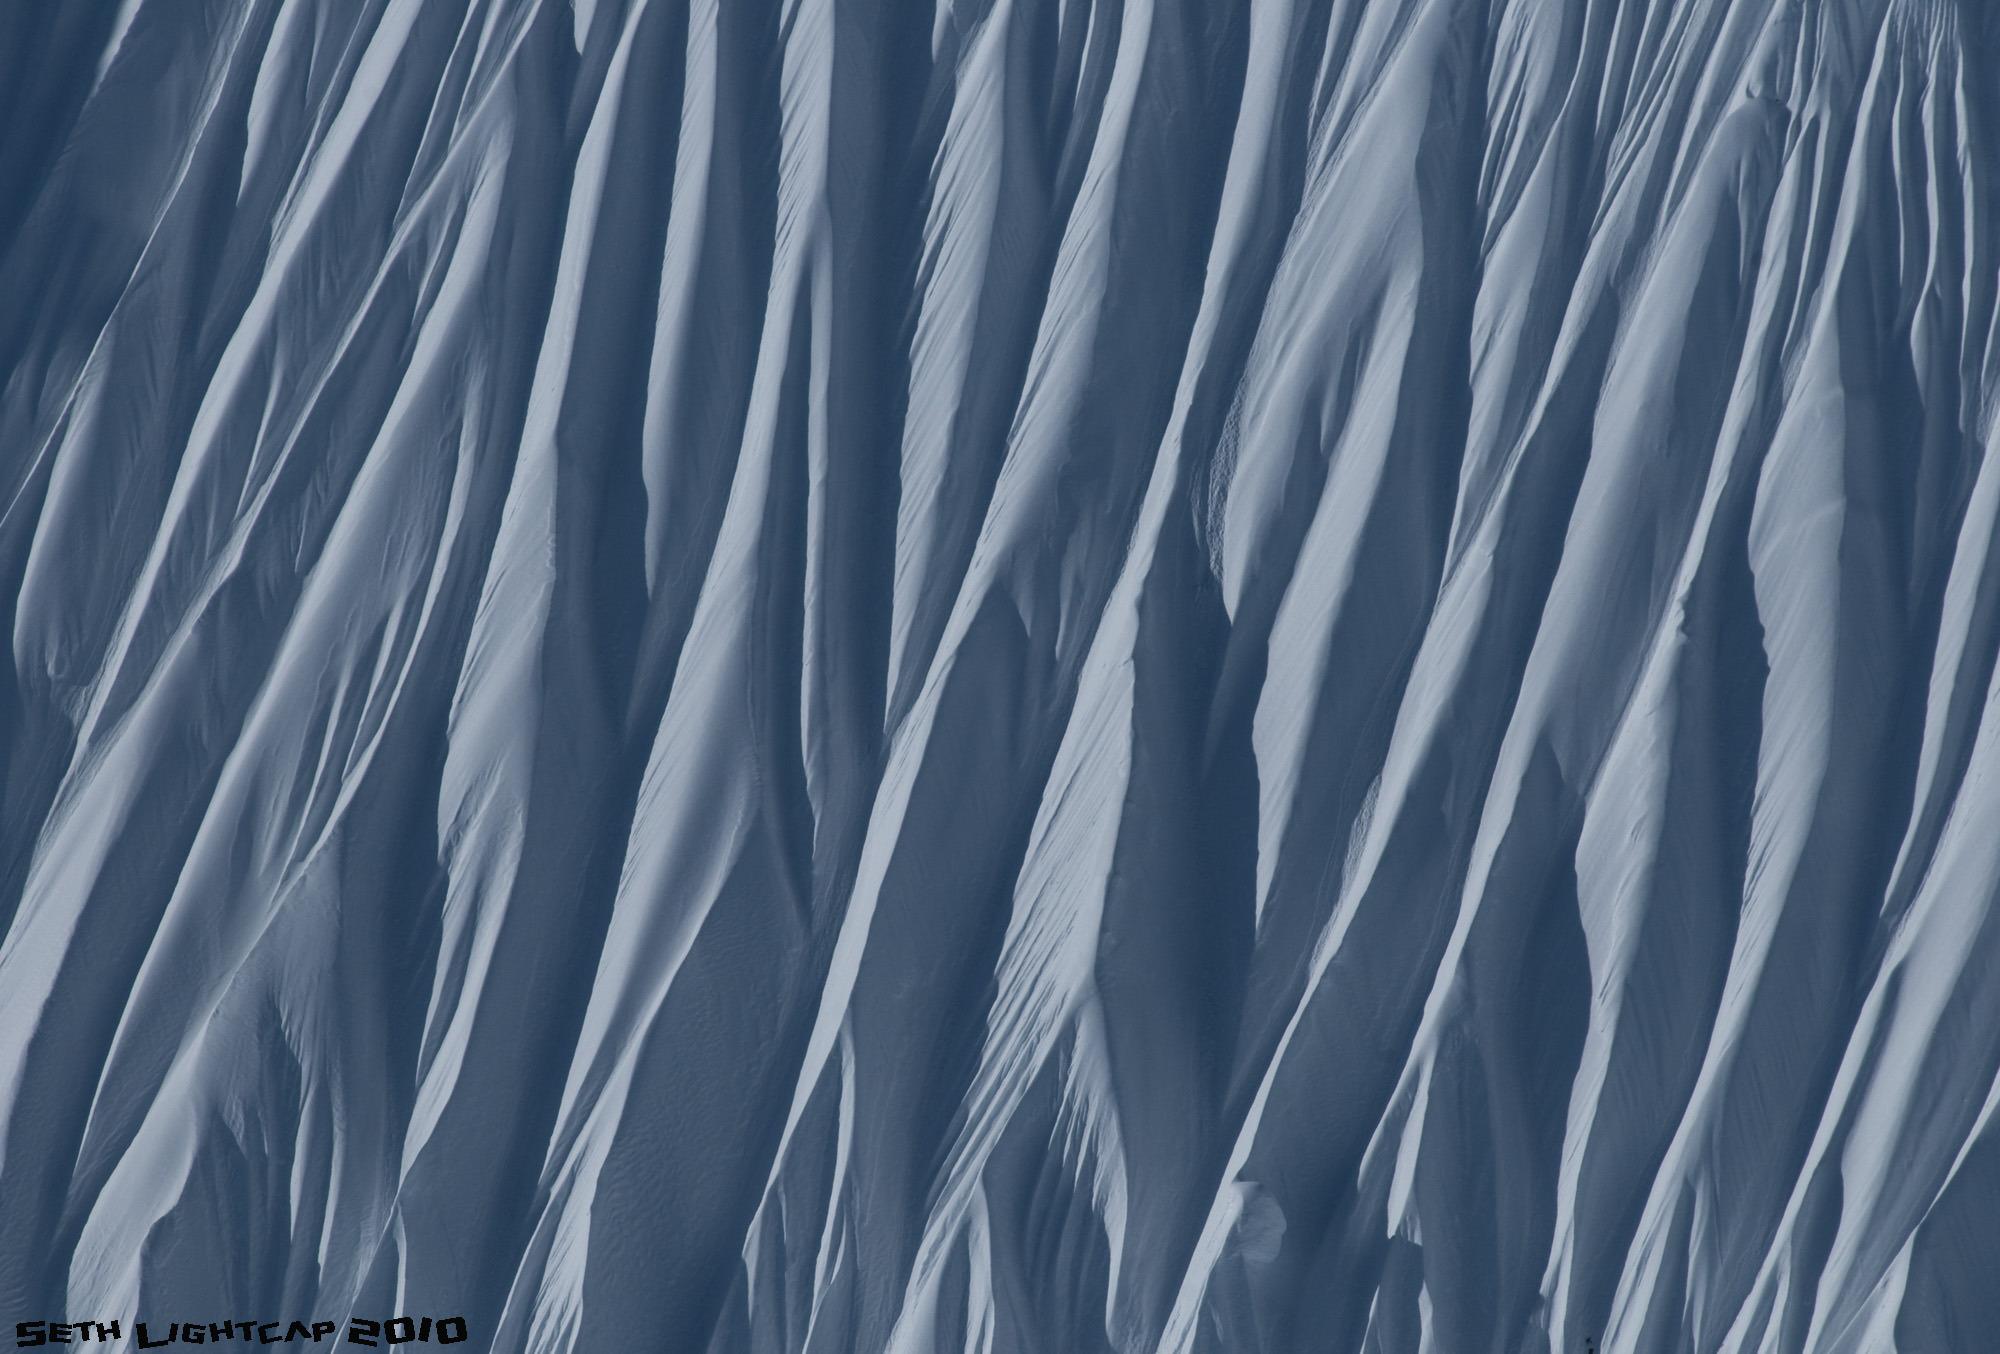 Spines in the AK Fairweather Range